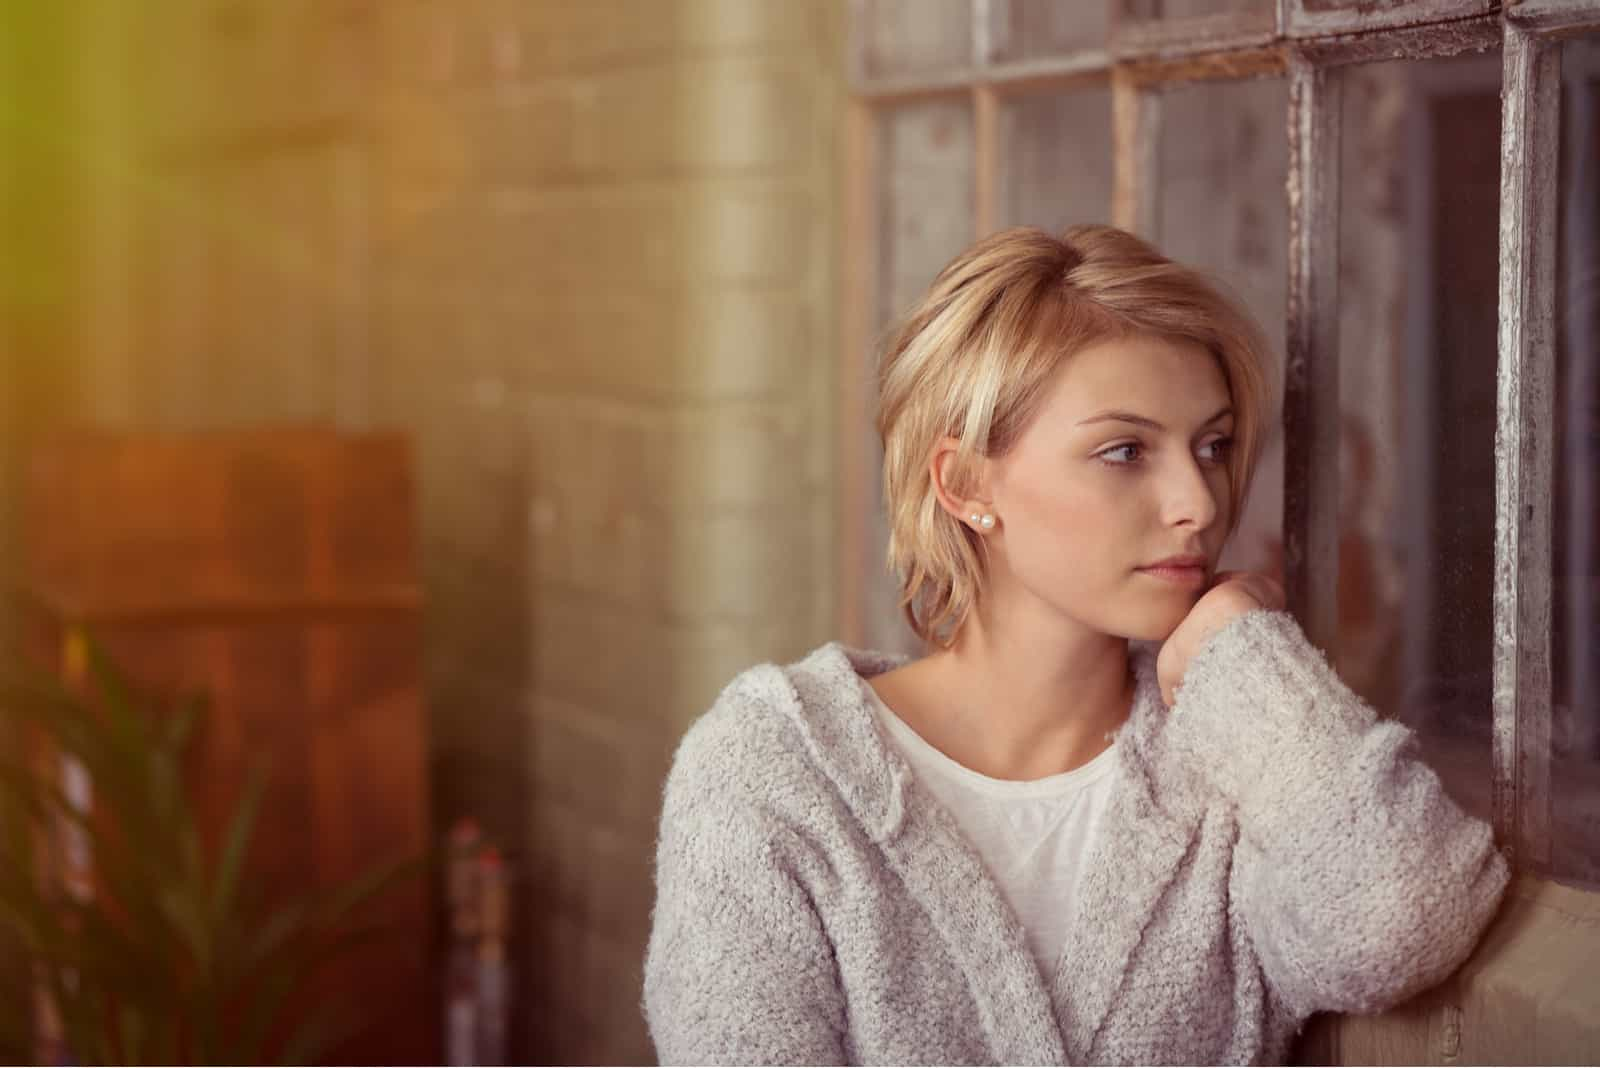 Jeune femme assise à rêvasser